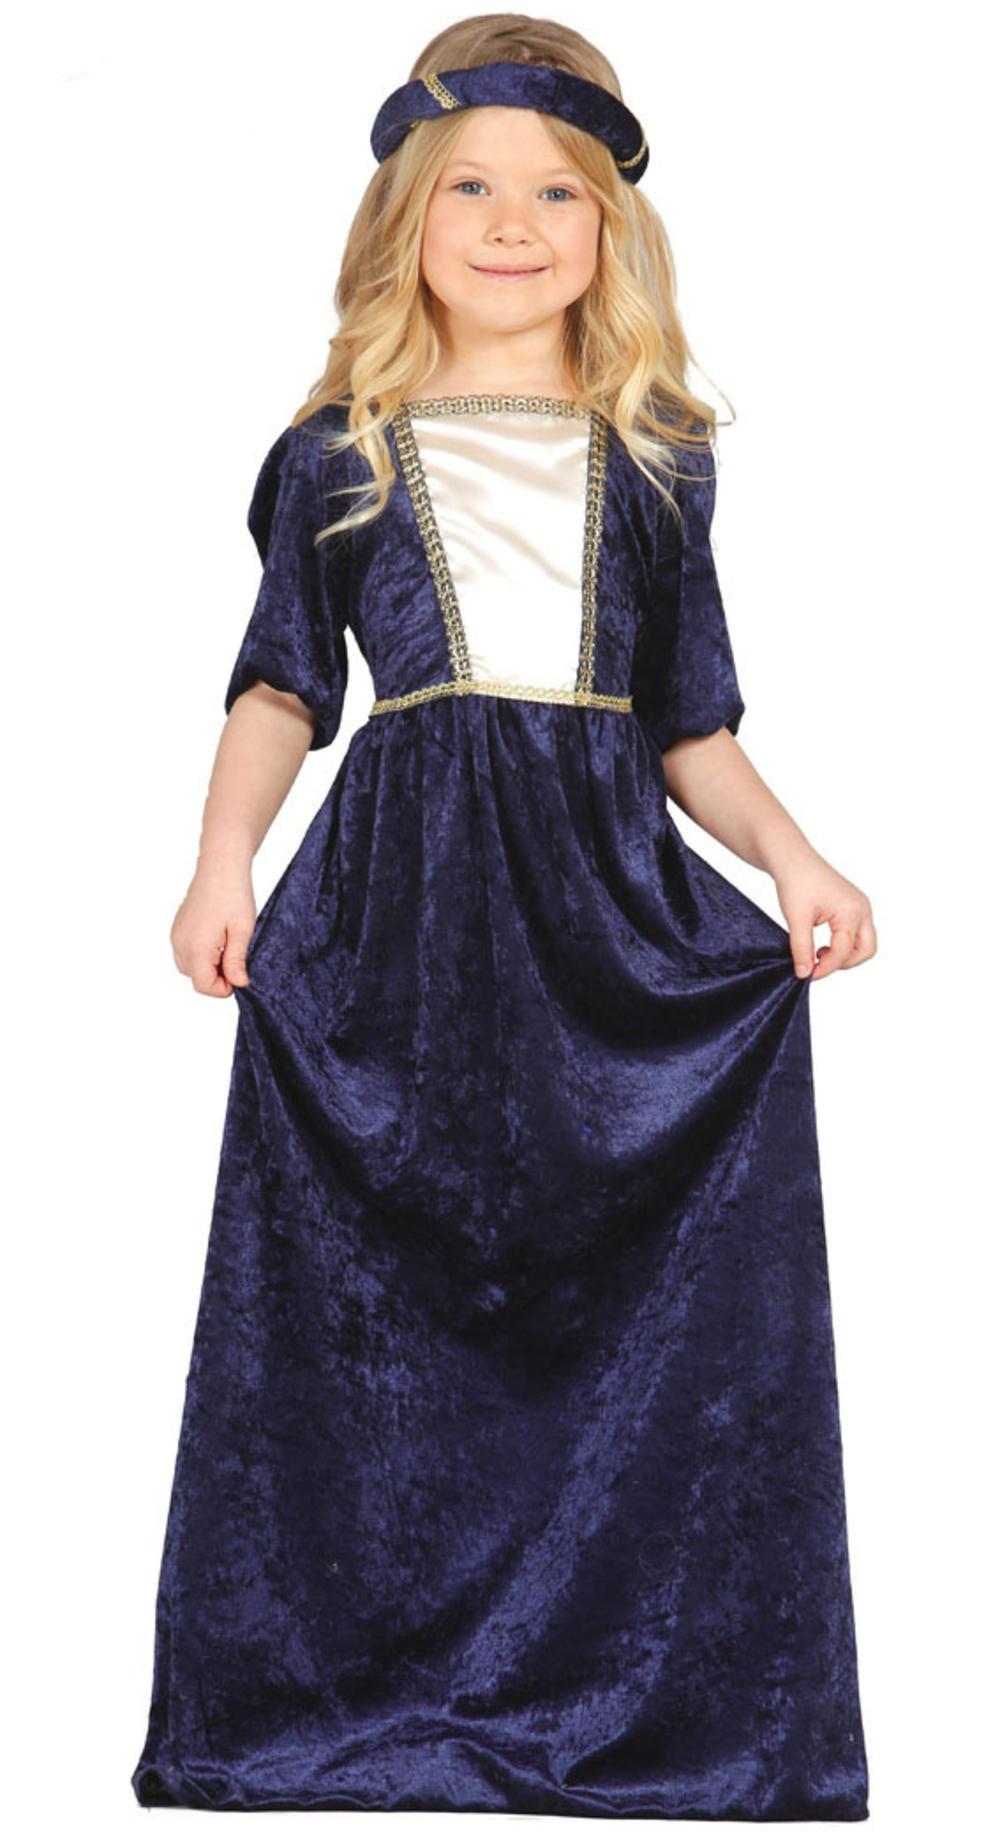 Medieval Lady Girls Costume